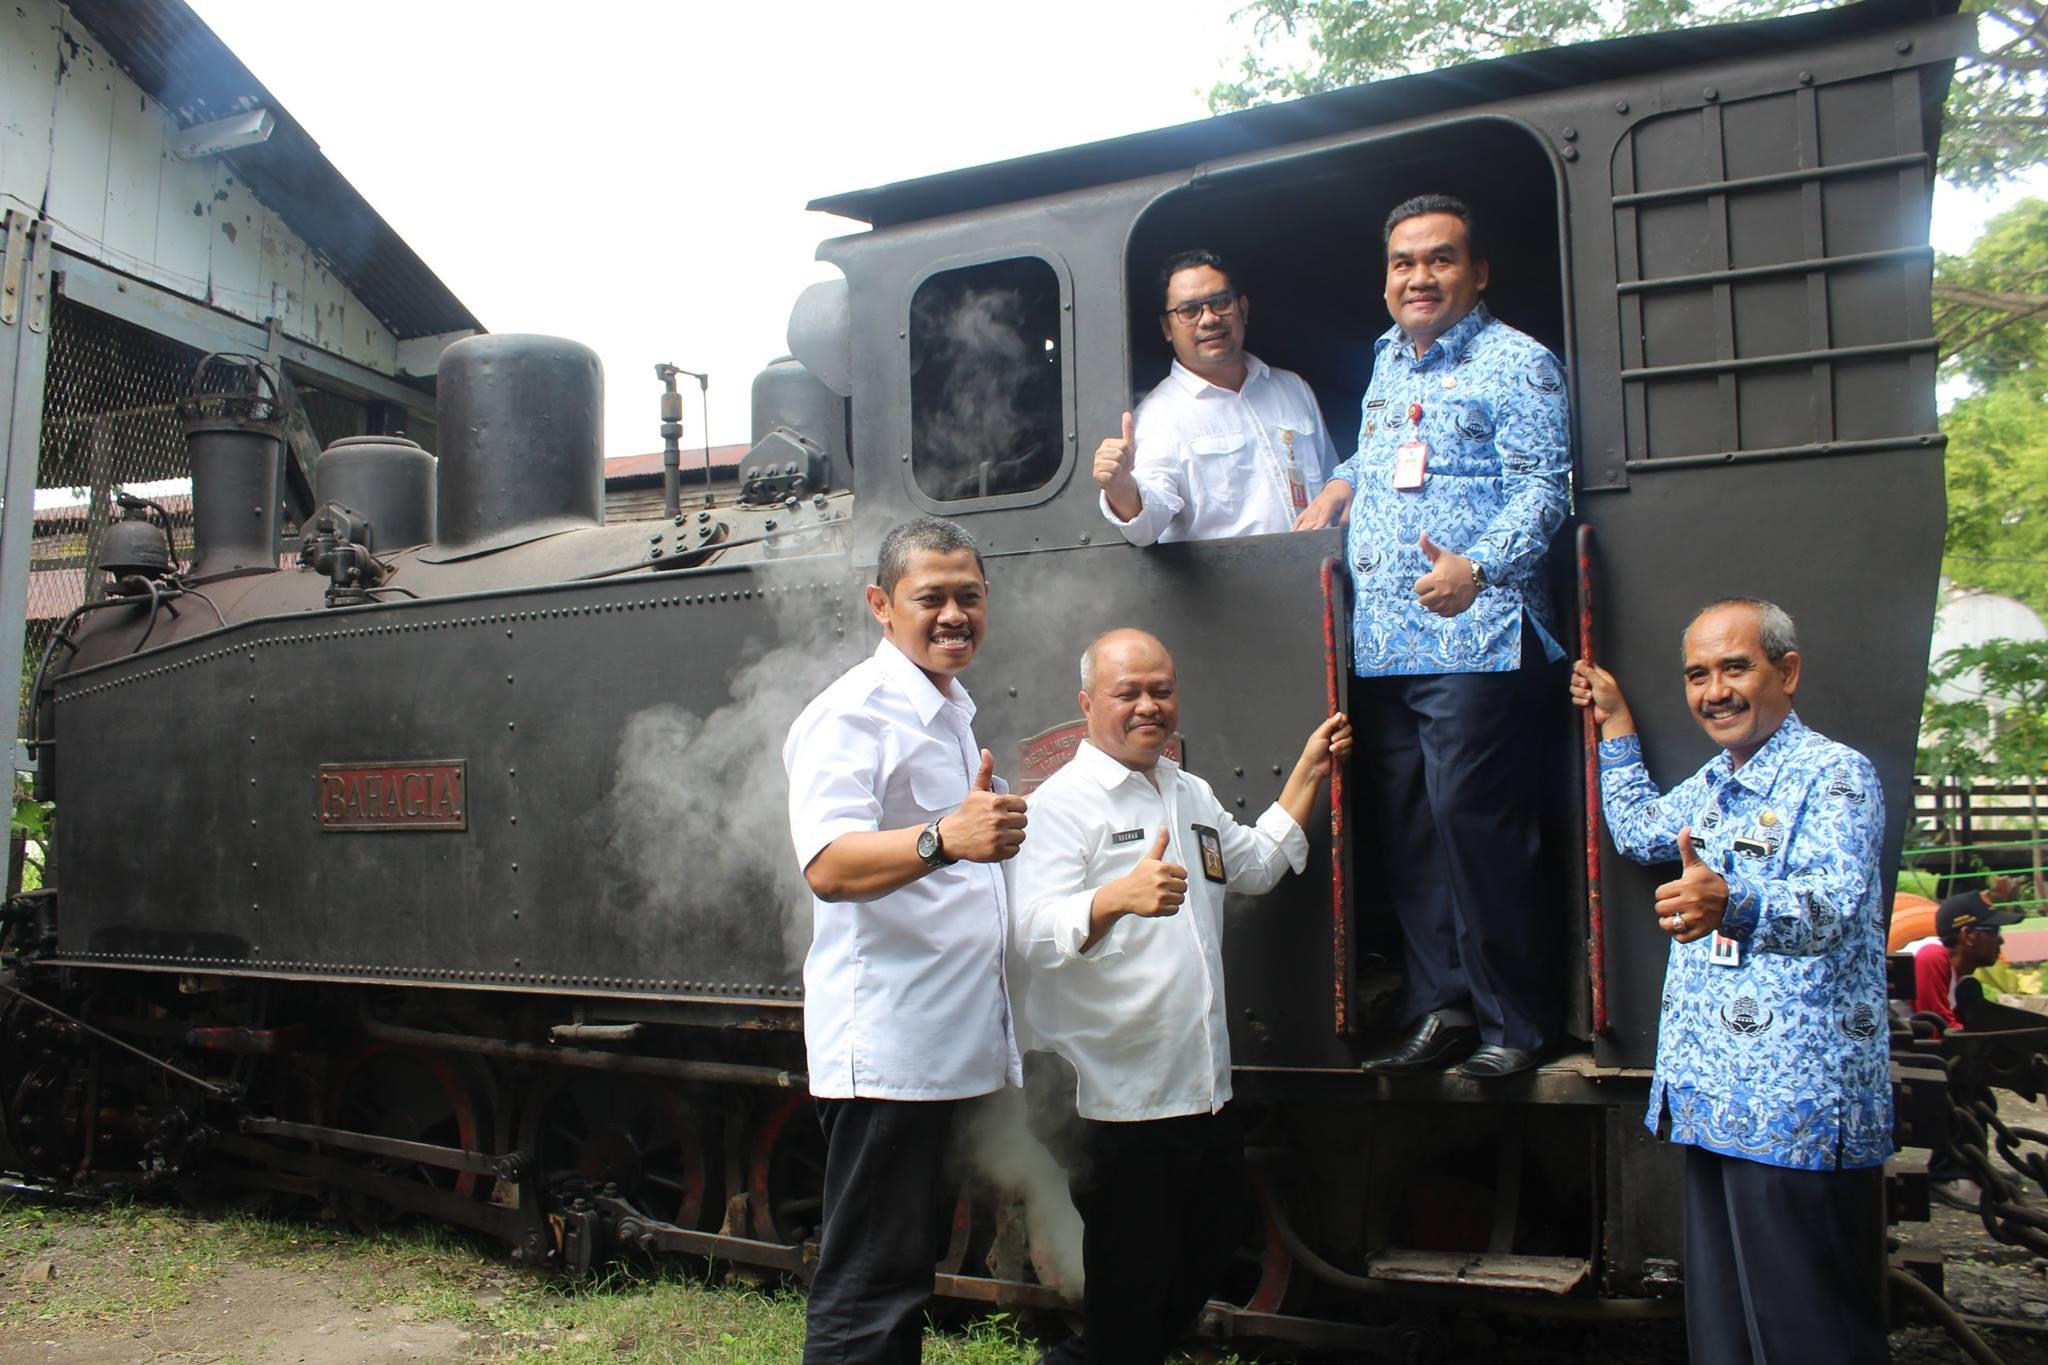 Launching Wisata Heritage Loko Tour Kph Cepu Oleh Wakil Bupati